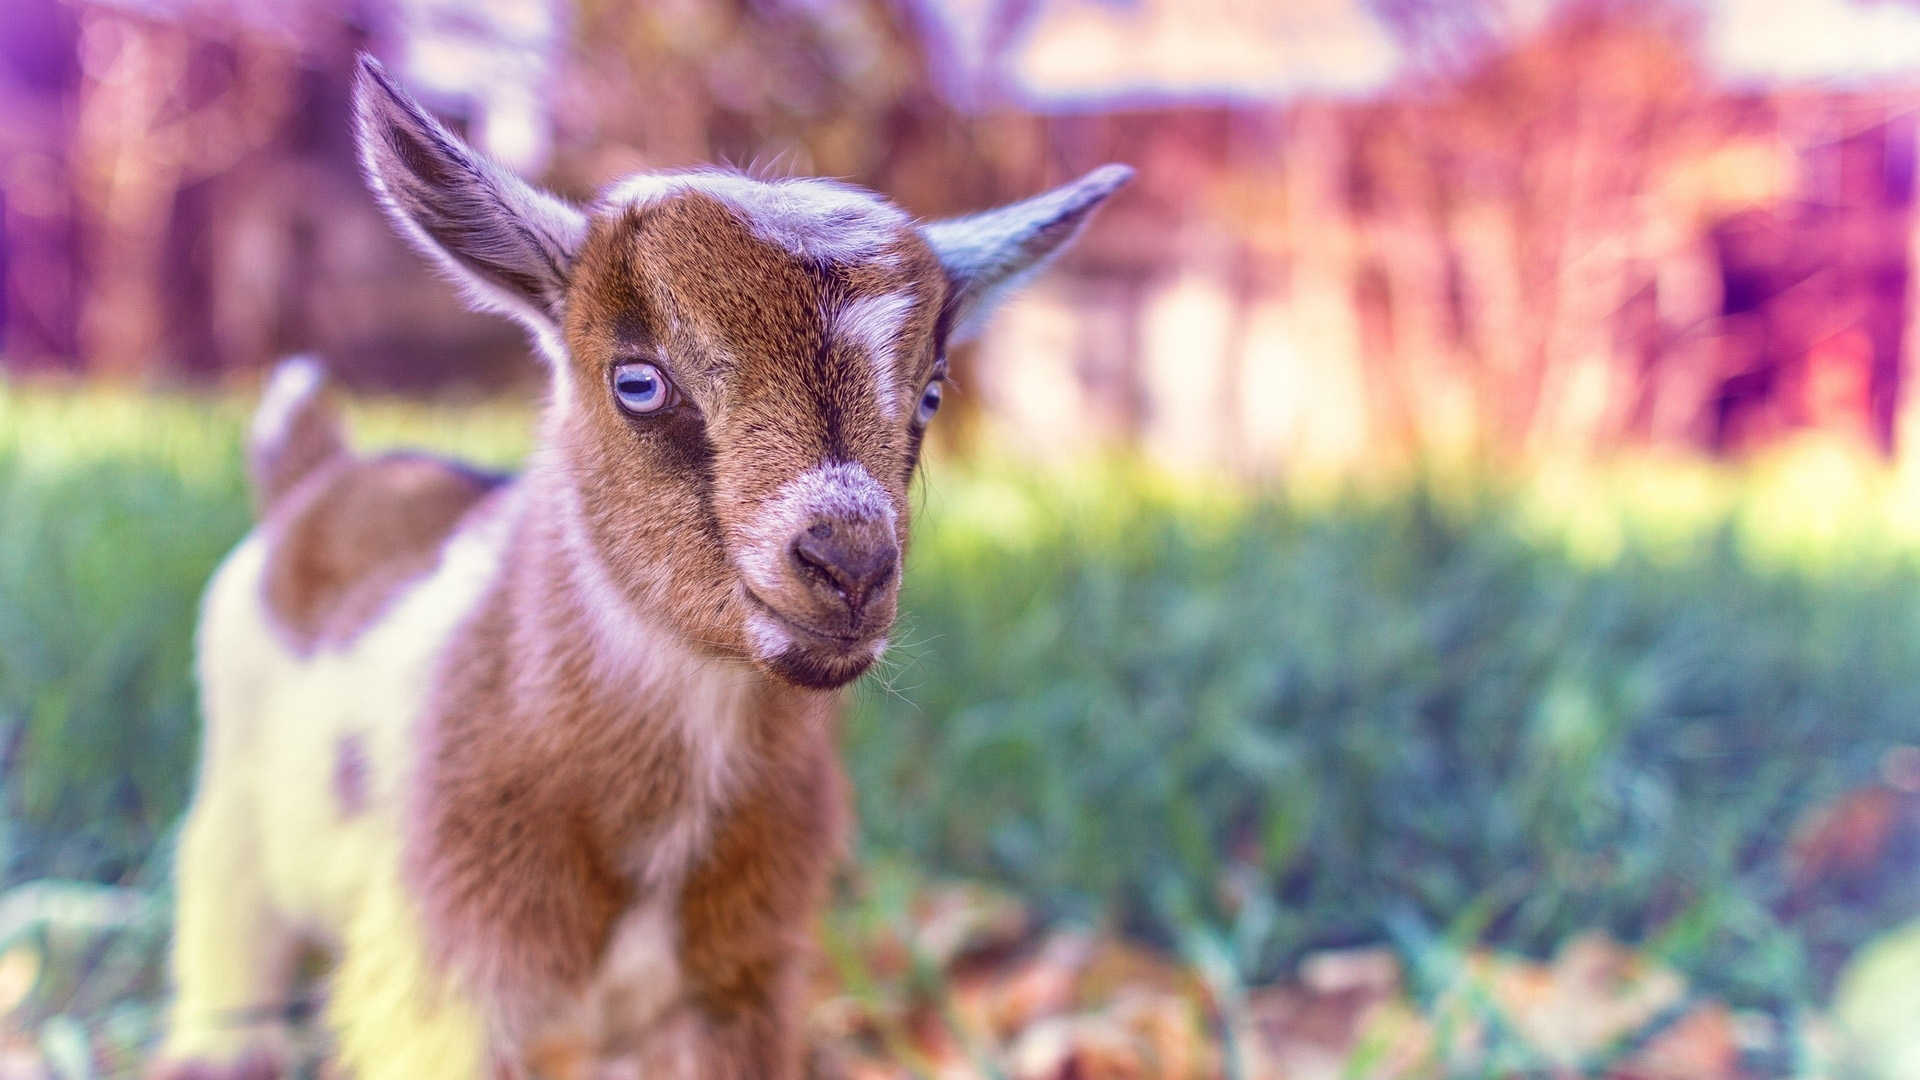 Deadshot wallpaper galleryhip com the hippest galleries - Cute Baby Goat Wallpaper